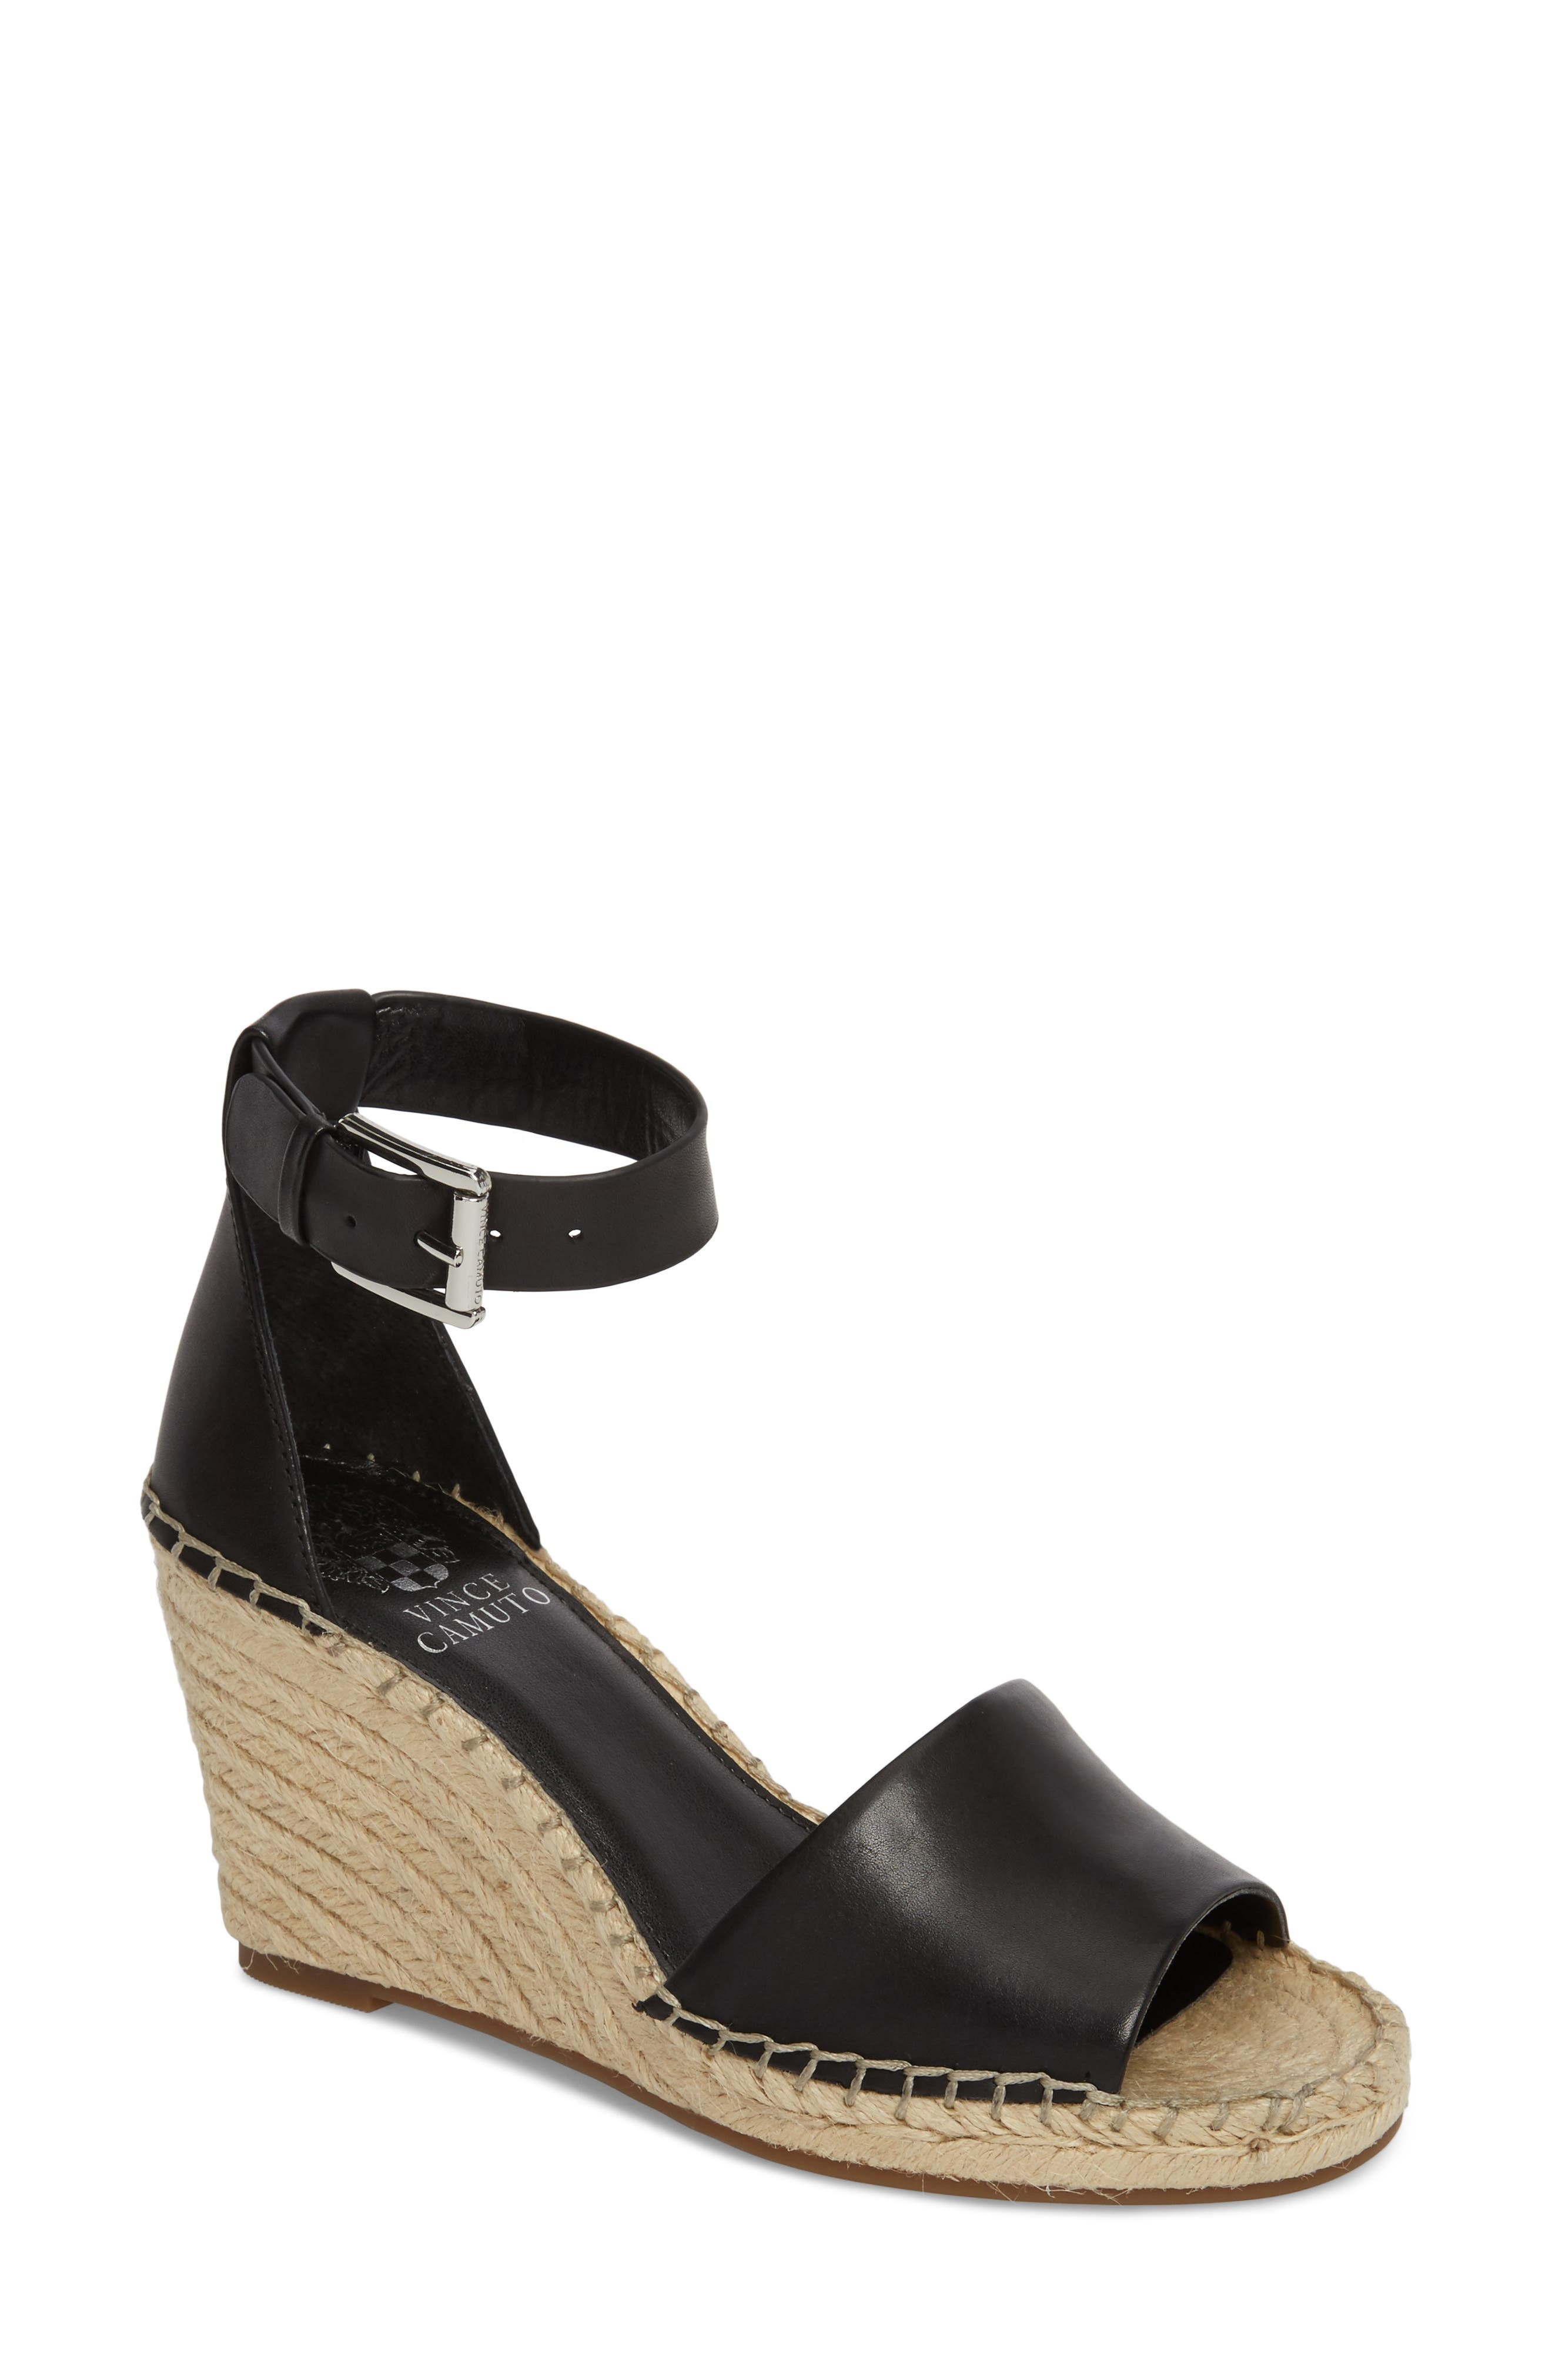 Leera Wedge Sandal,                             Main thumbnail 1, color,                             Black